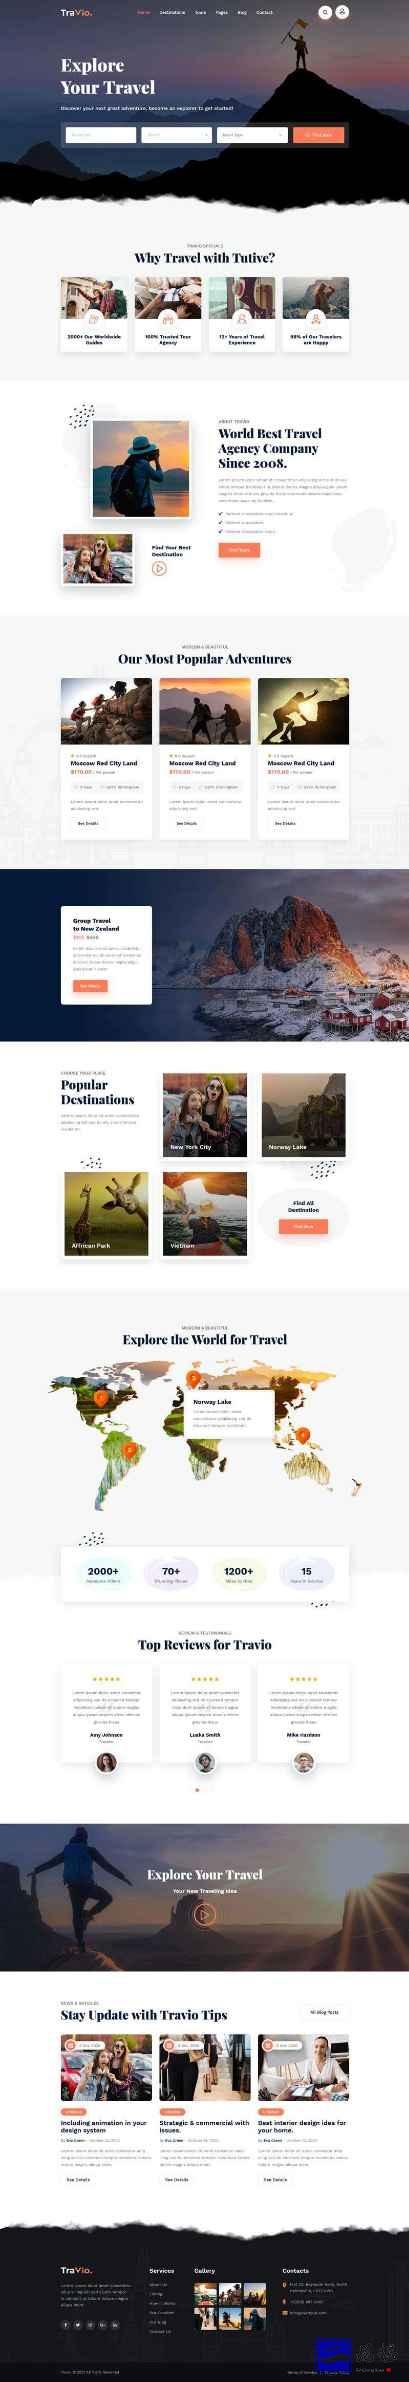 html5旅行社官网模板插图